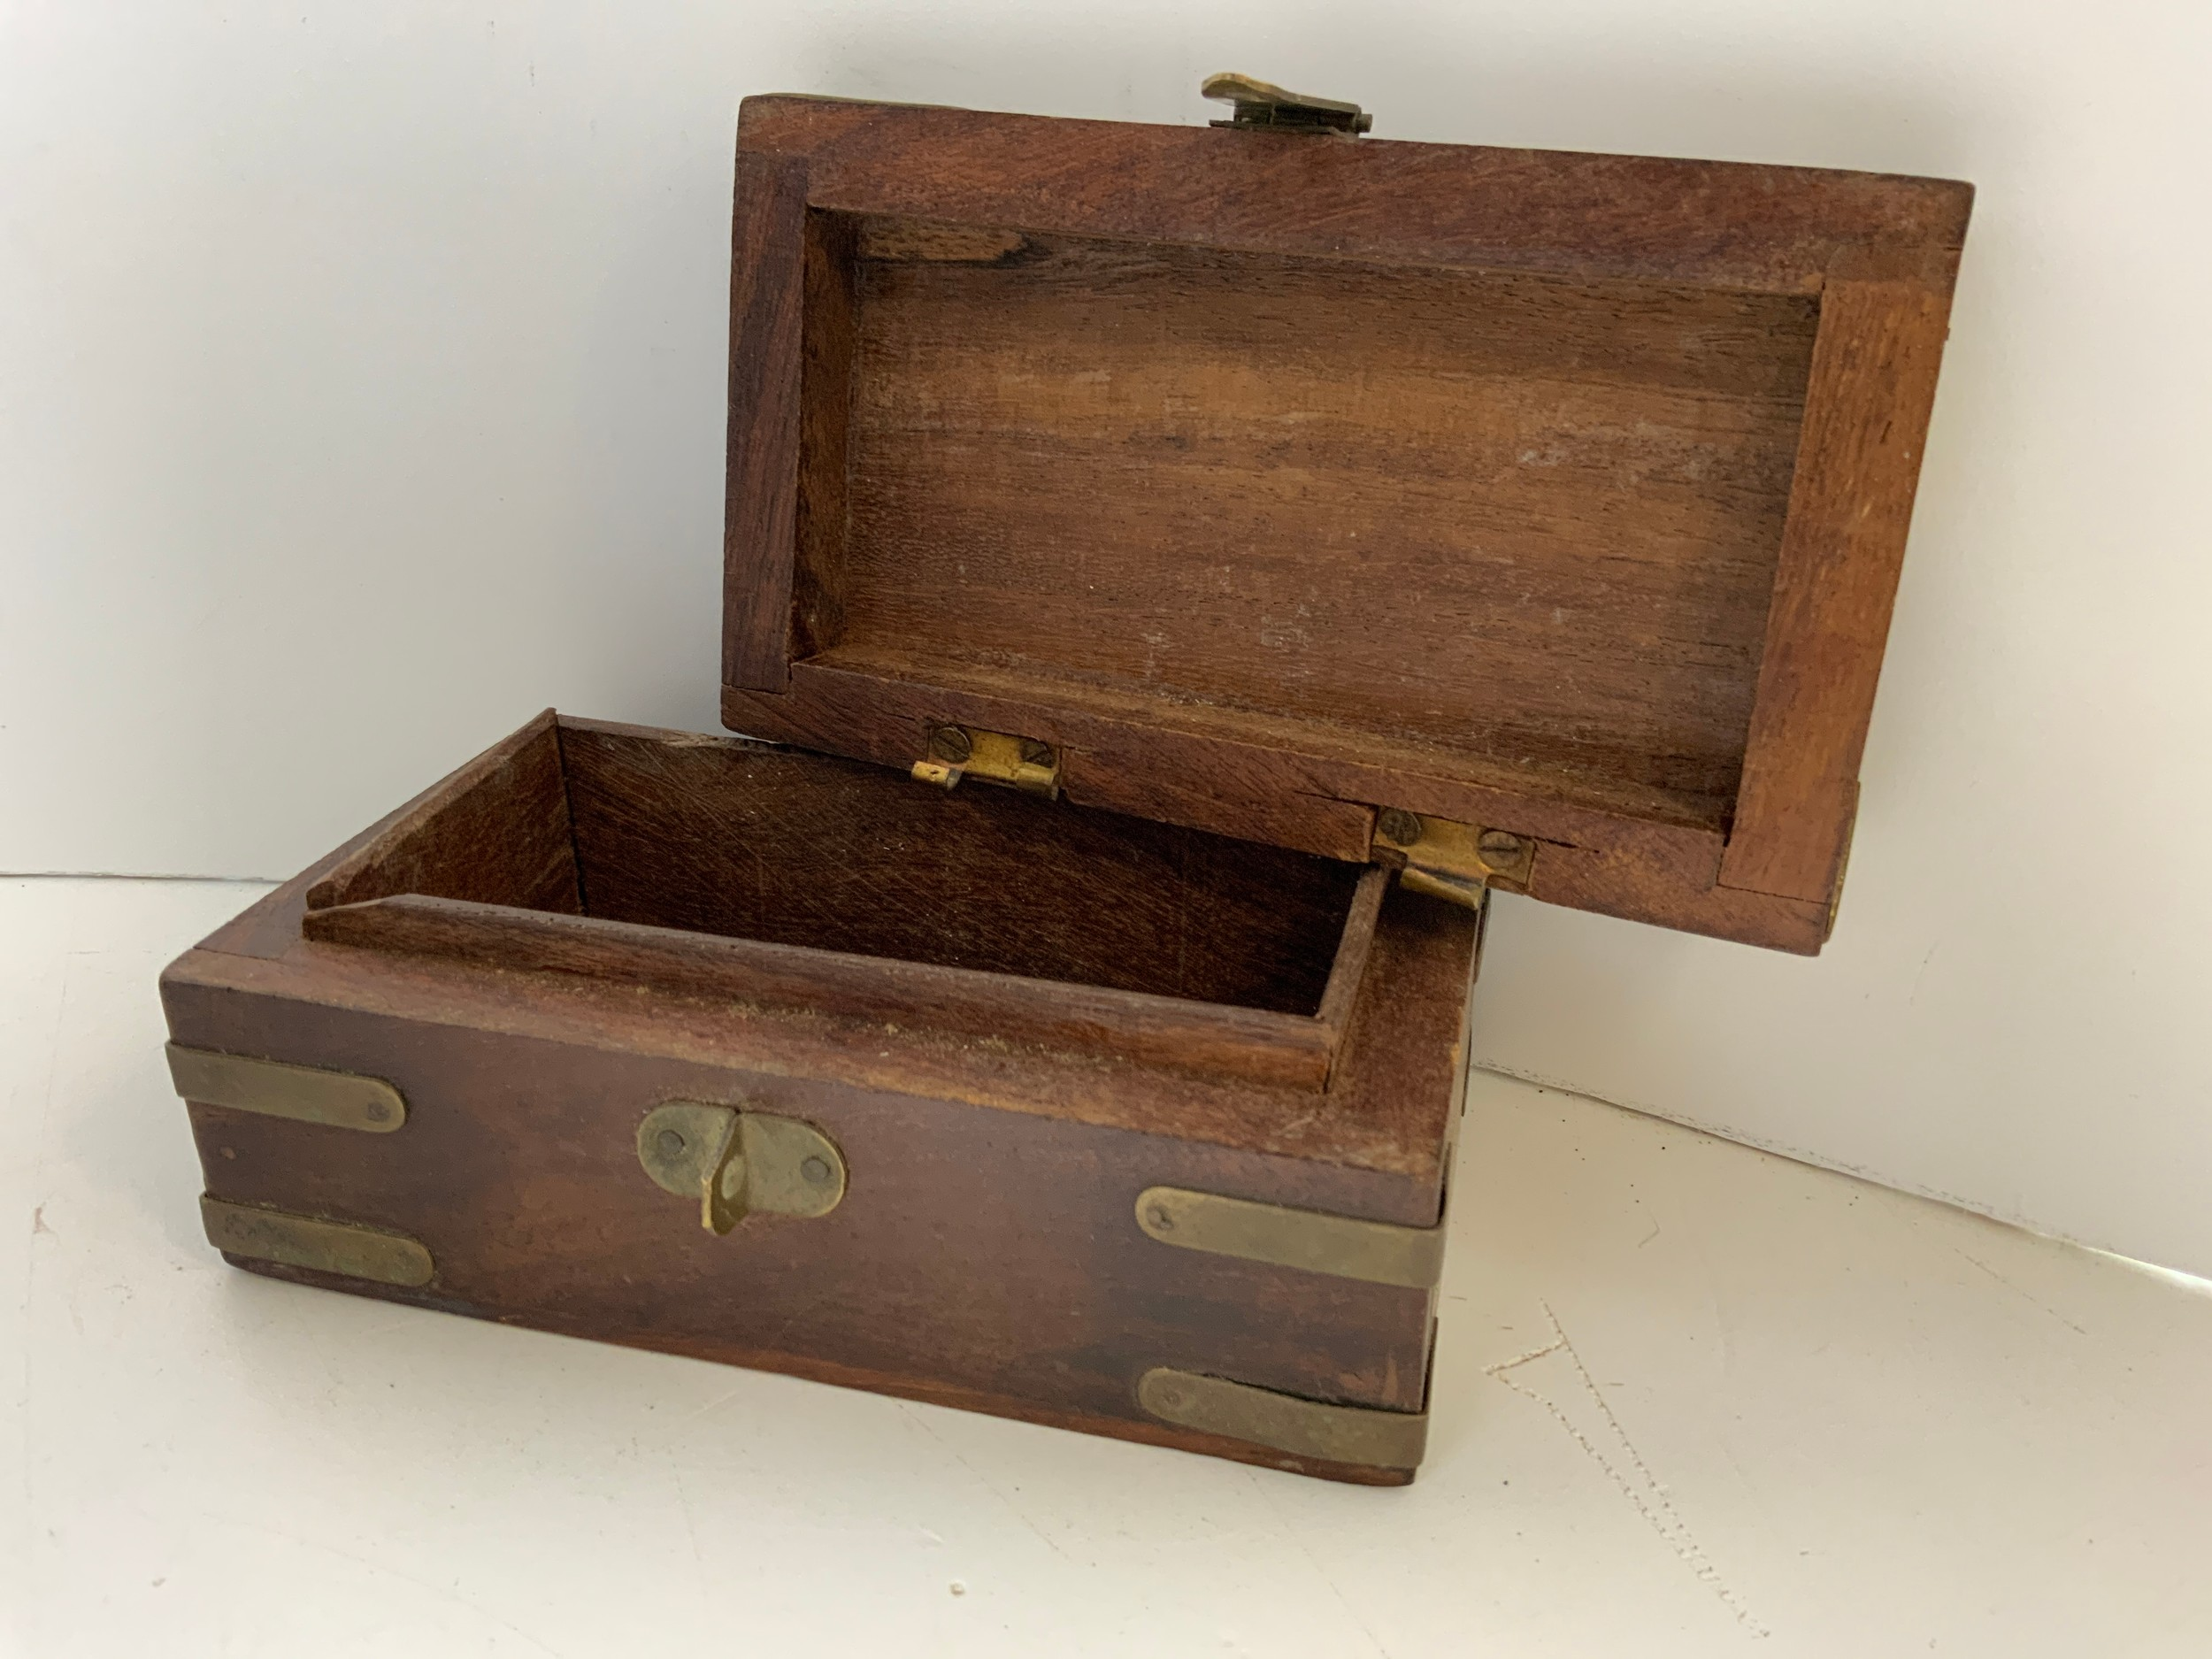 Oak Cutlery Box, Brass Bound Trinket Box and Ebony Writing Box for Restoration - Image 3 of 3